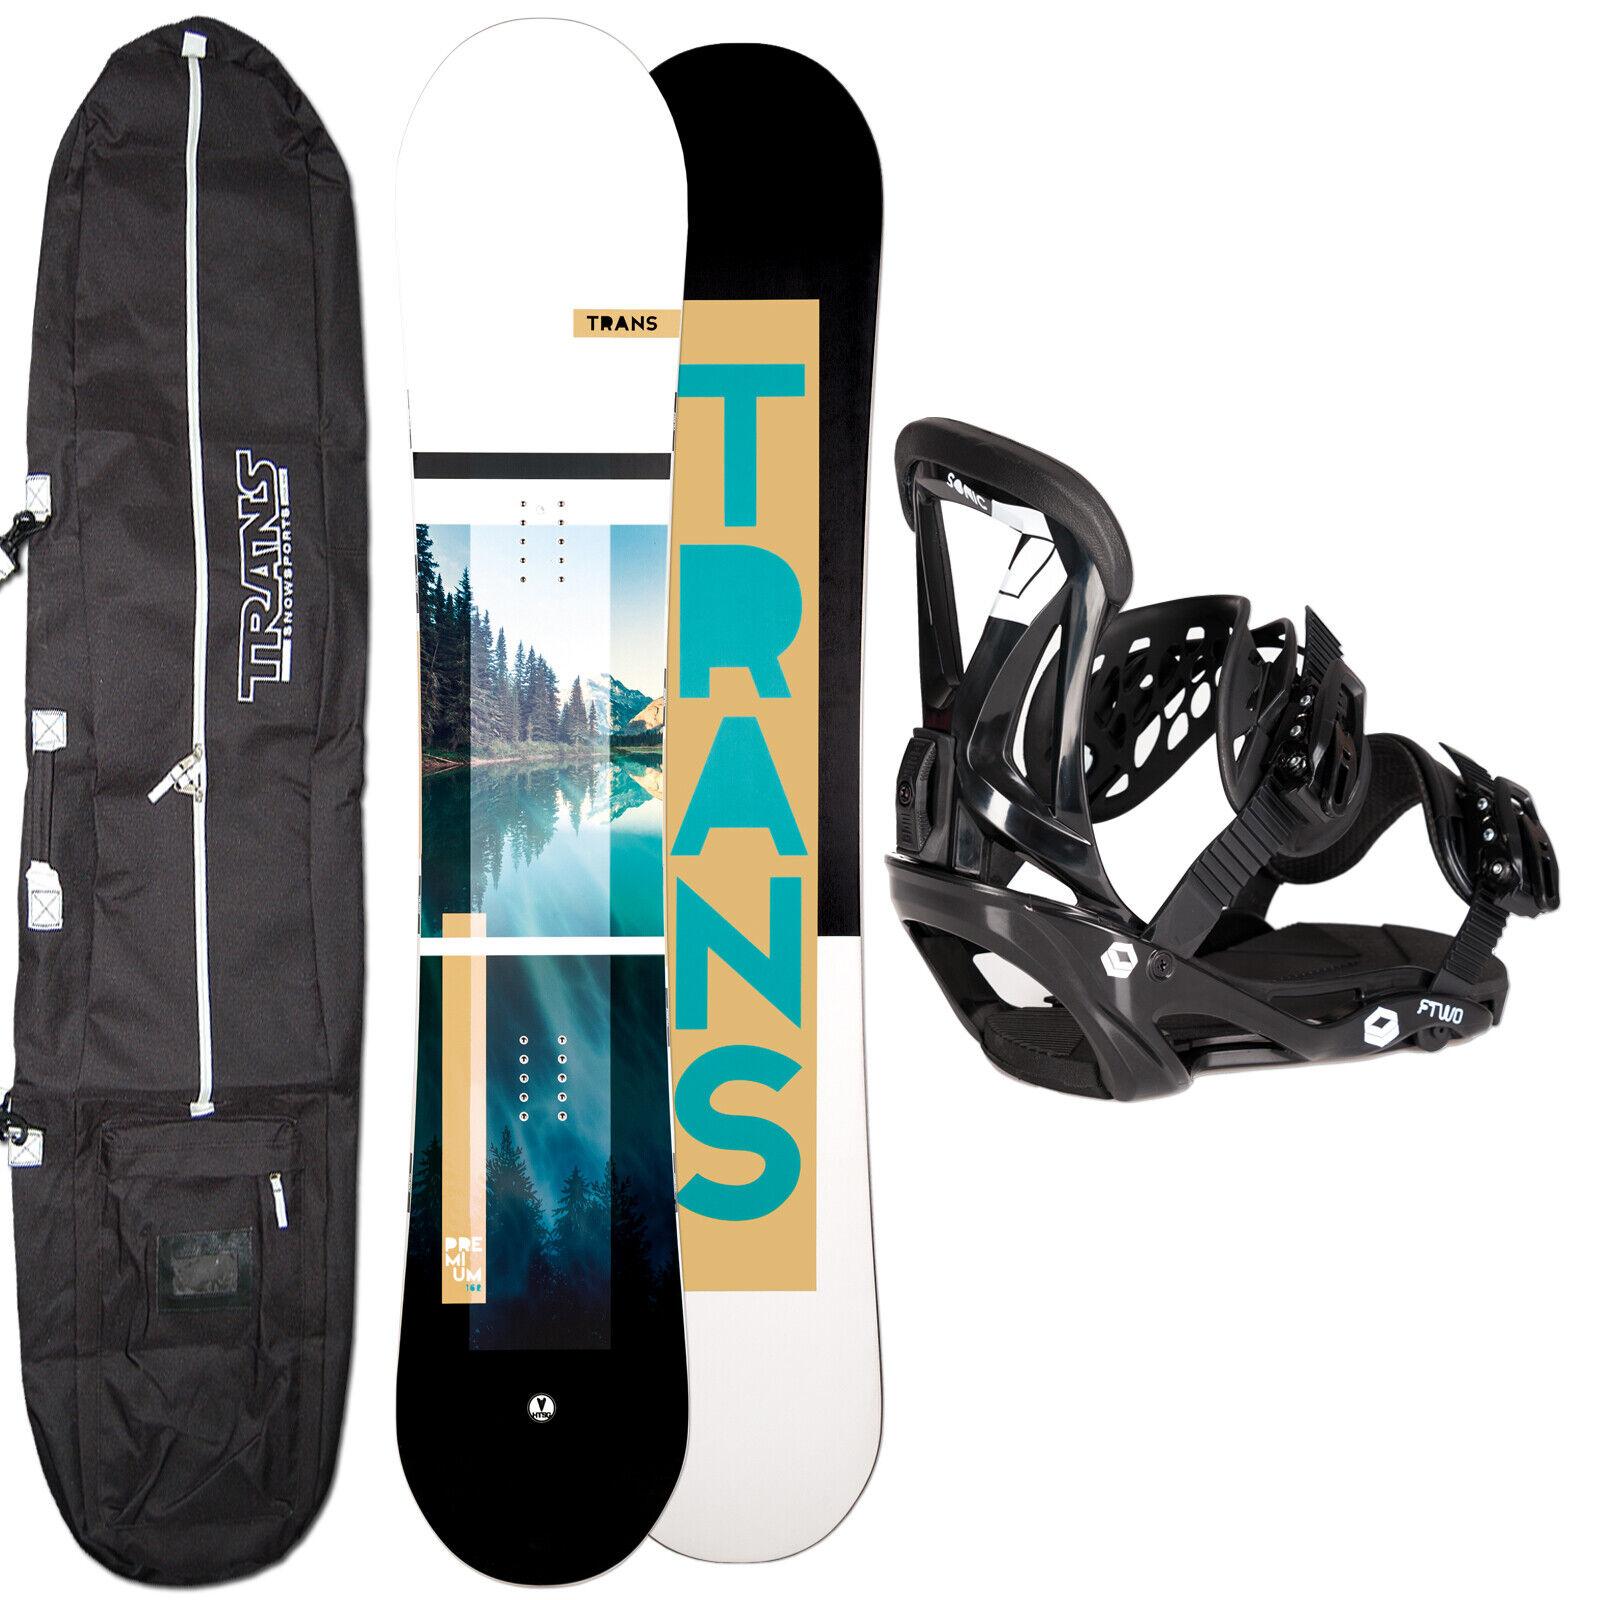 Hombres Snowboard Trans Premium Team 153cm 2019 + Ftwo Sonic Fijación Talla